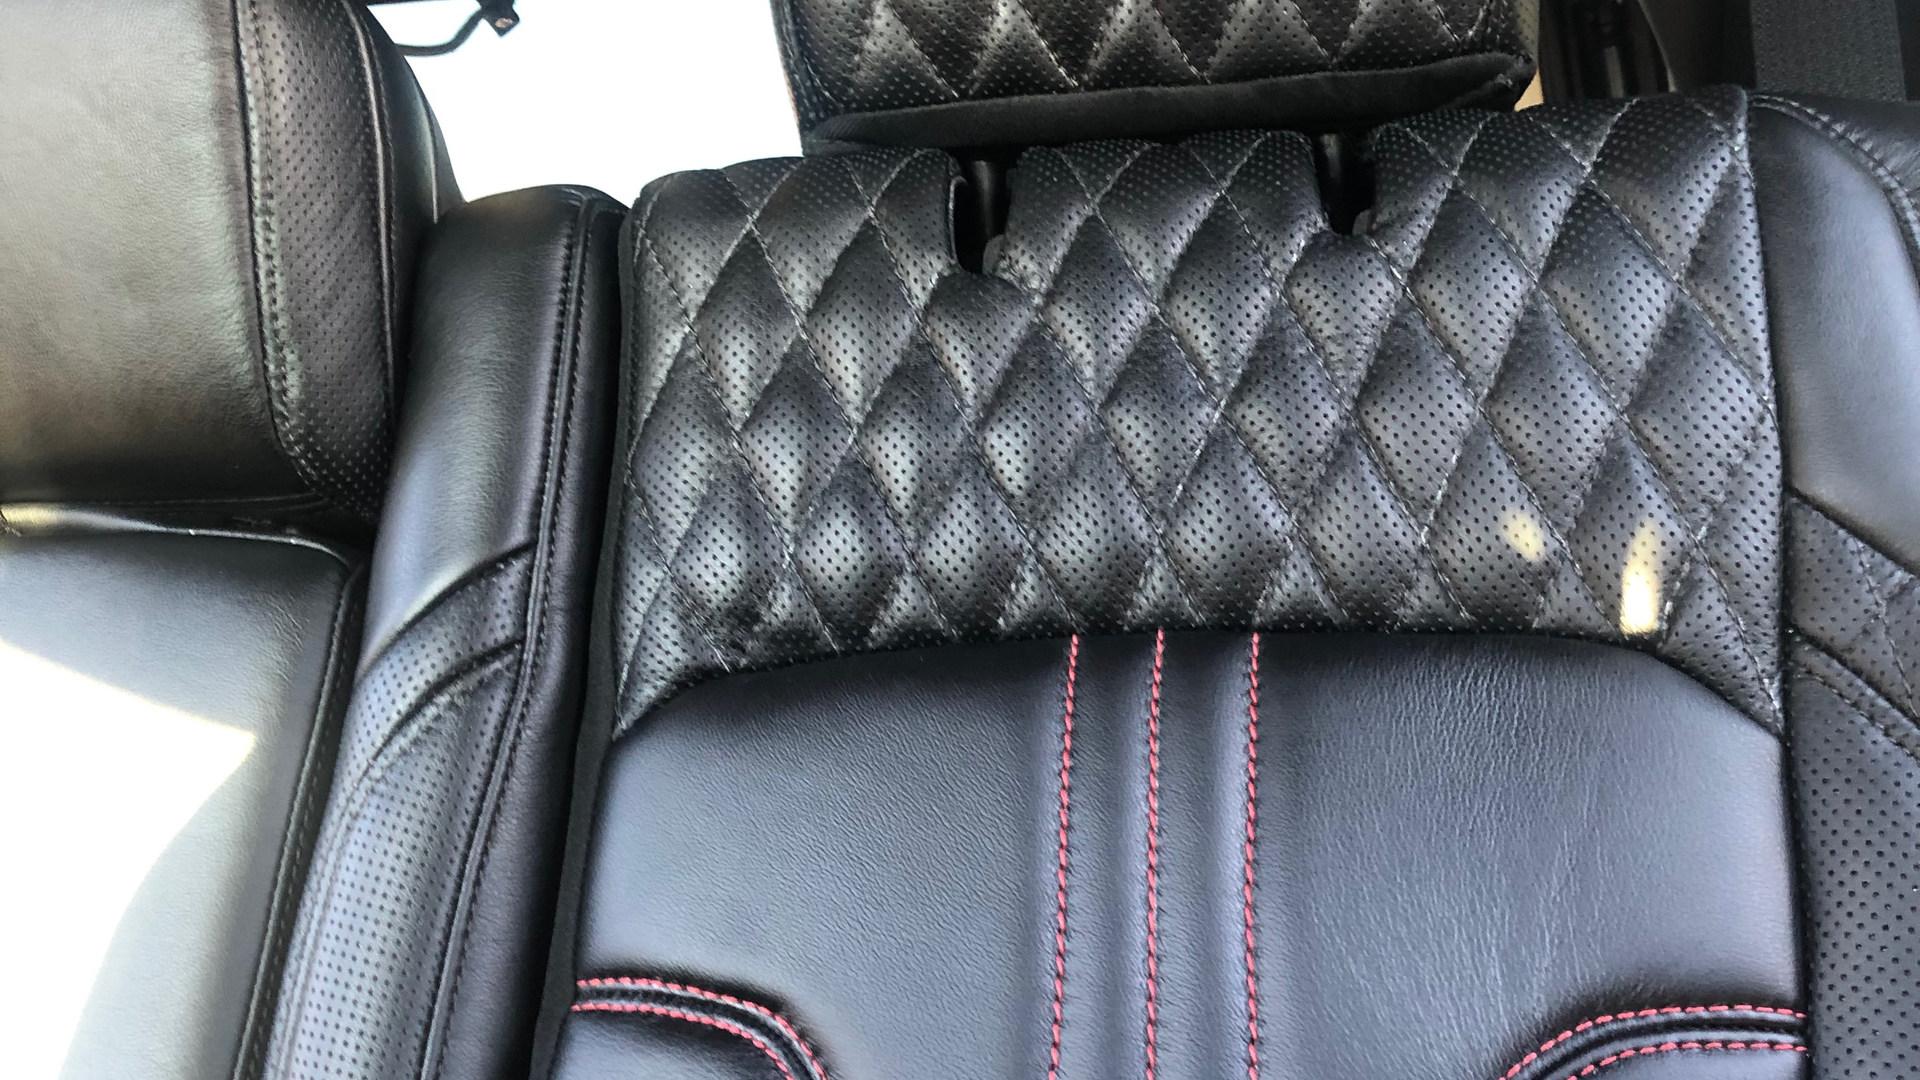 Custom leather with diamond stitch and red stitch